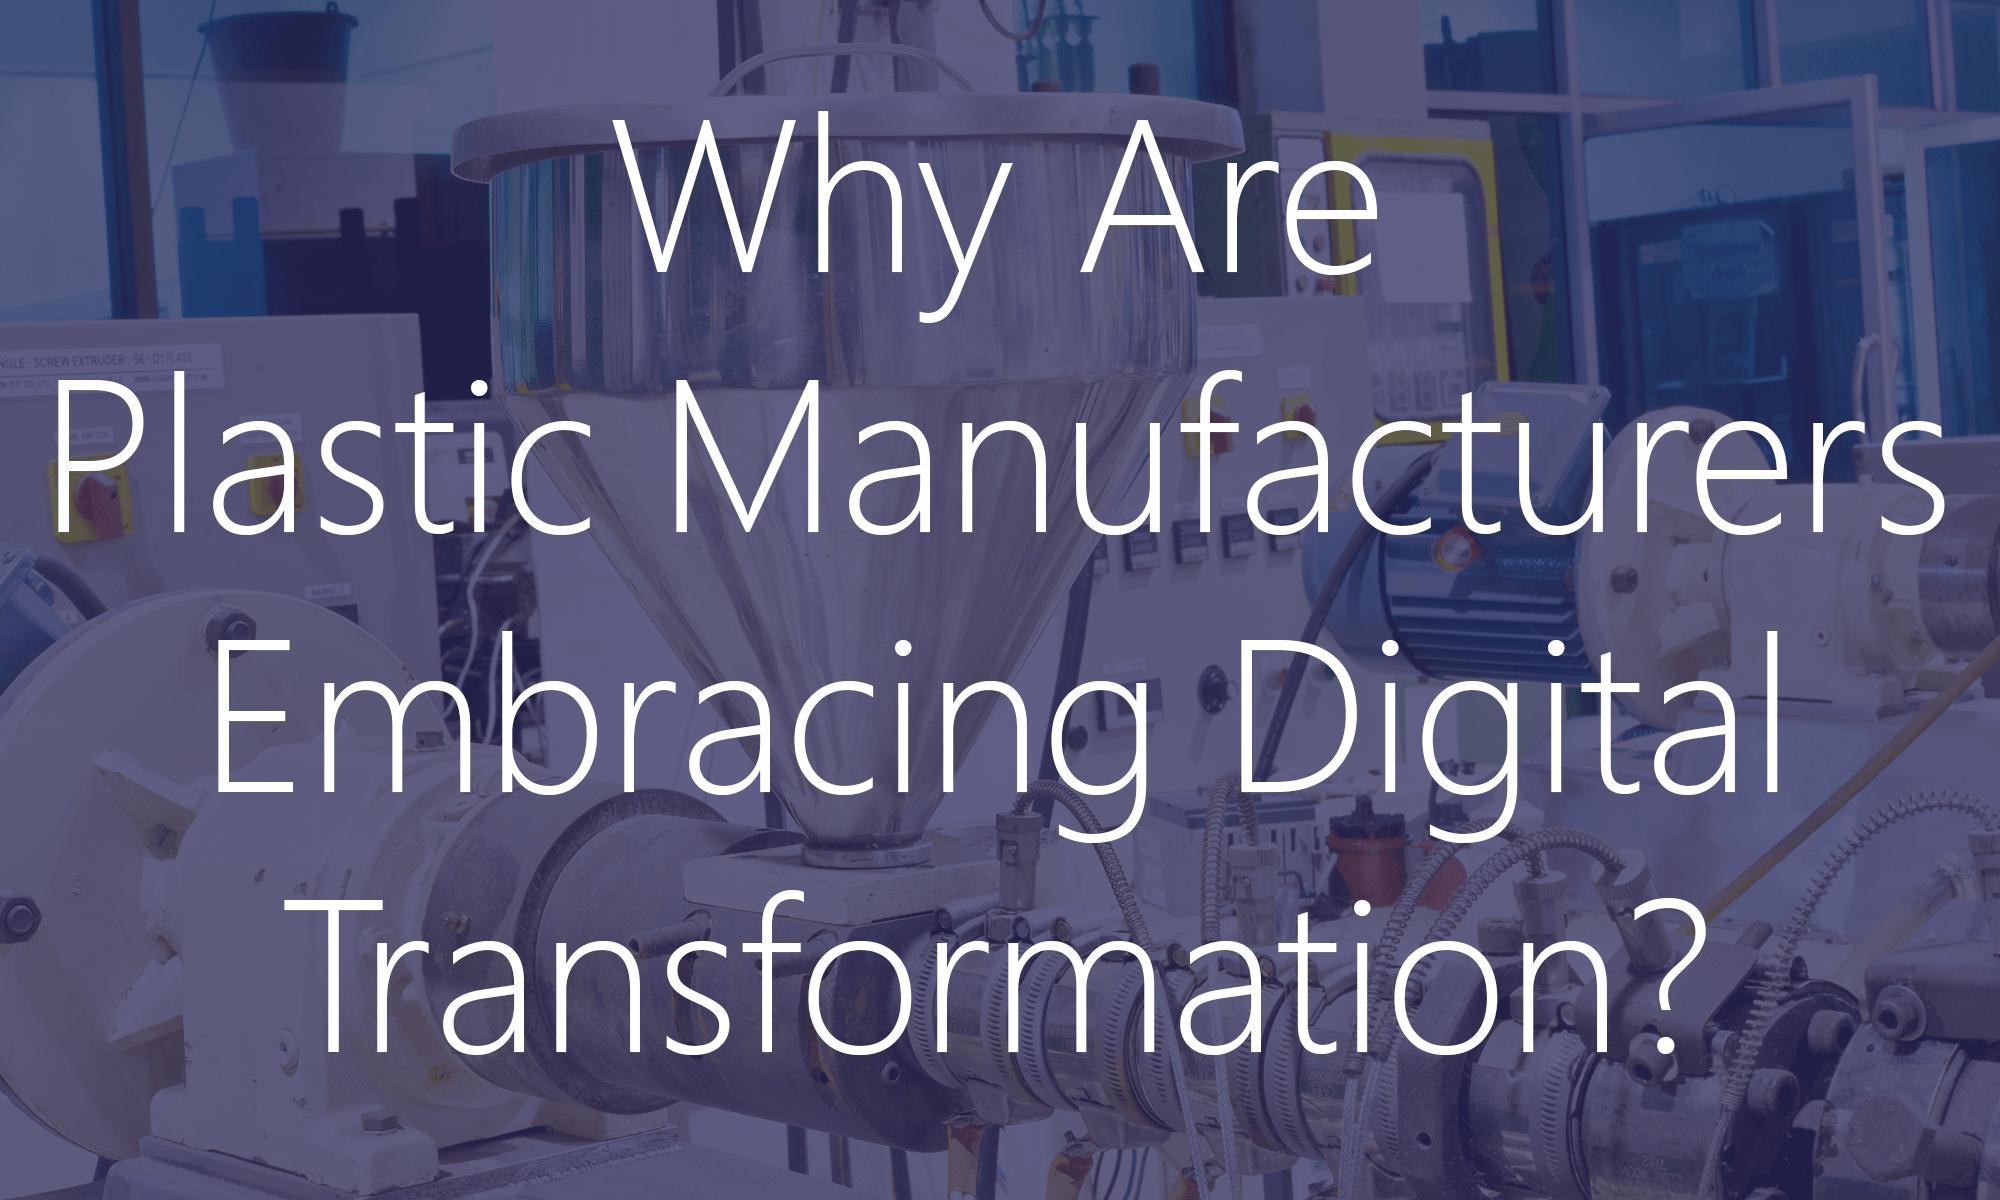 Digital Transformation in Plastics Manufacturing